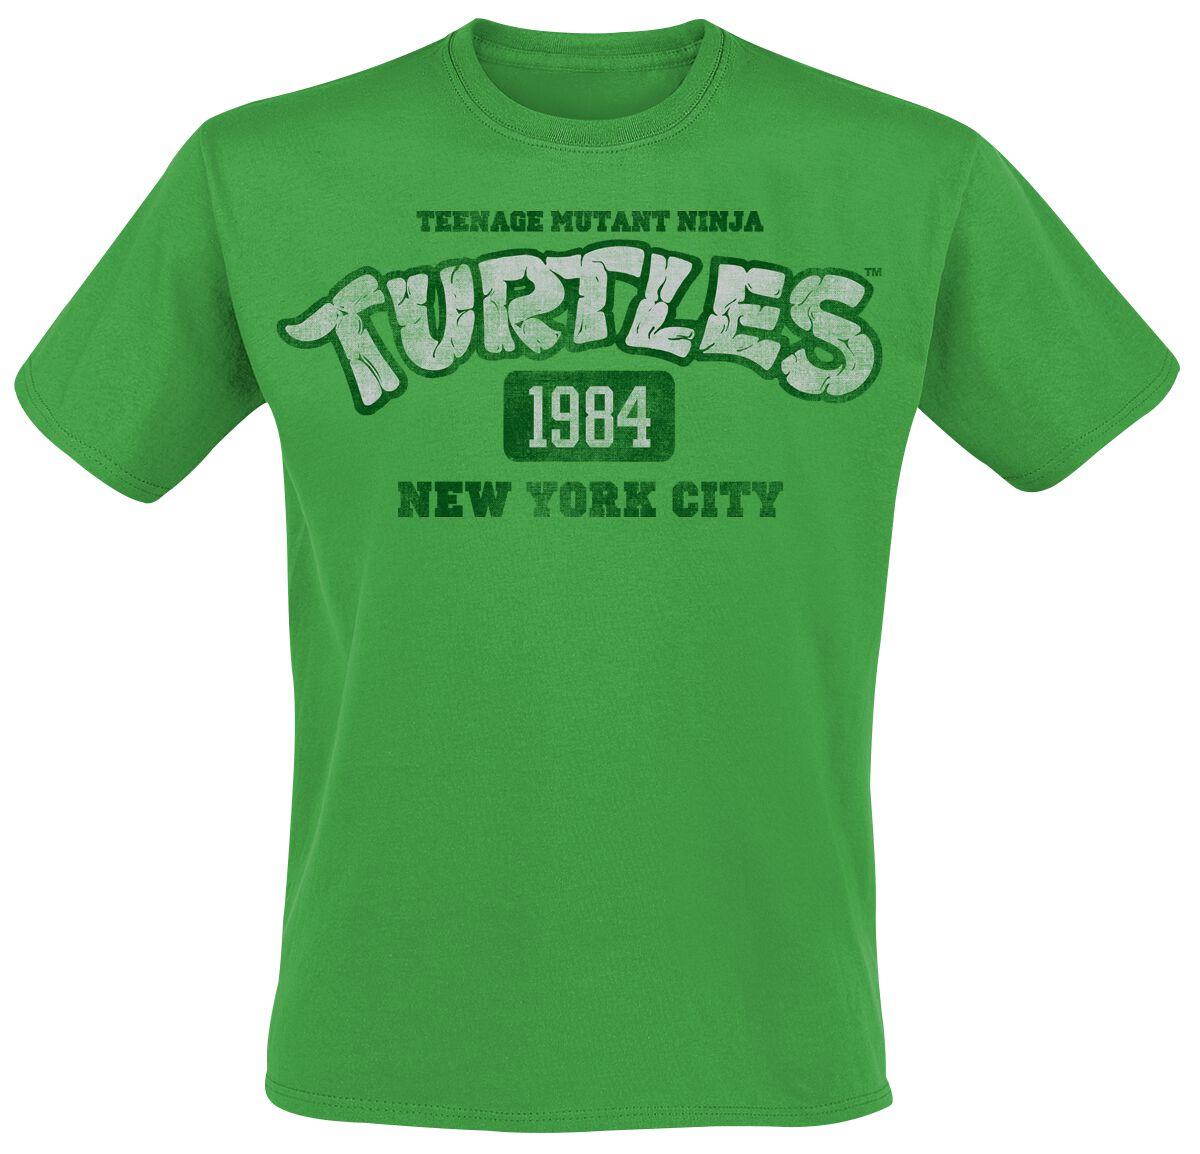 Merch dla Fanów - Koszulki - T-Shirt Teenage Mutant Ninja Turtles NY 1984 T-Shirt zielony - 357648